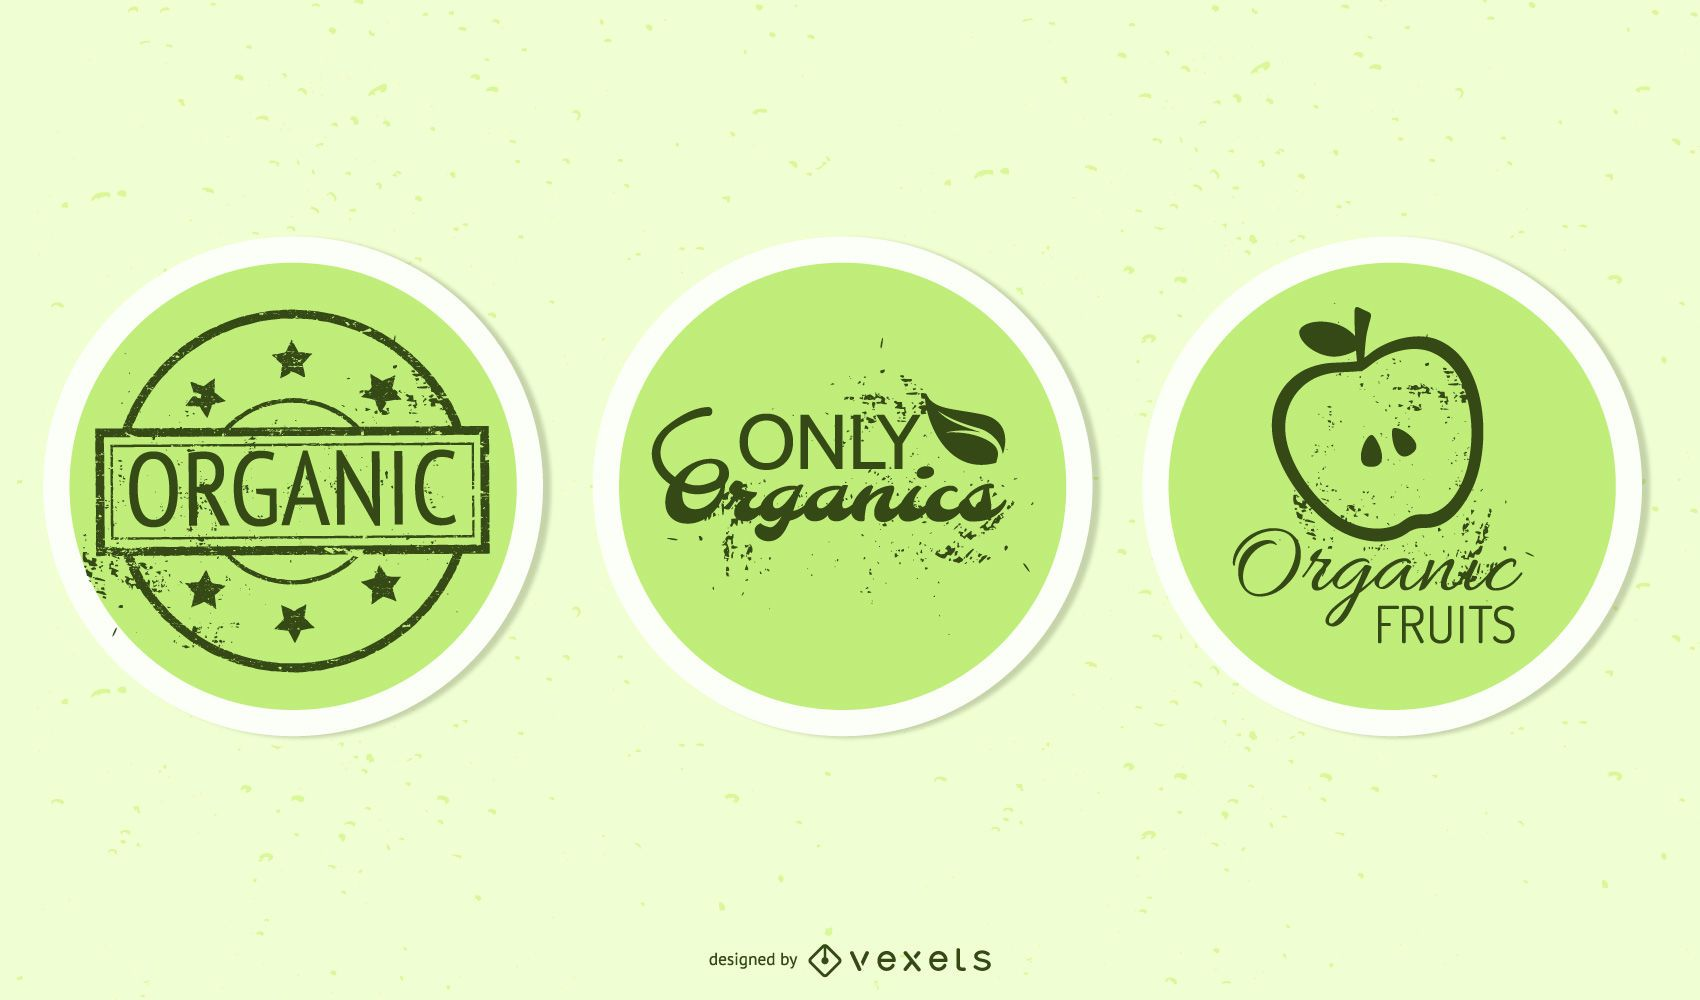 Organic Elliptical Product Sticker Pack